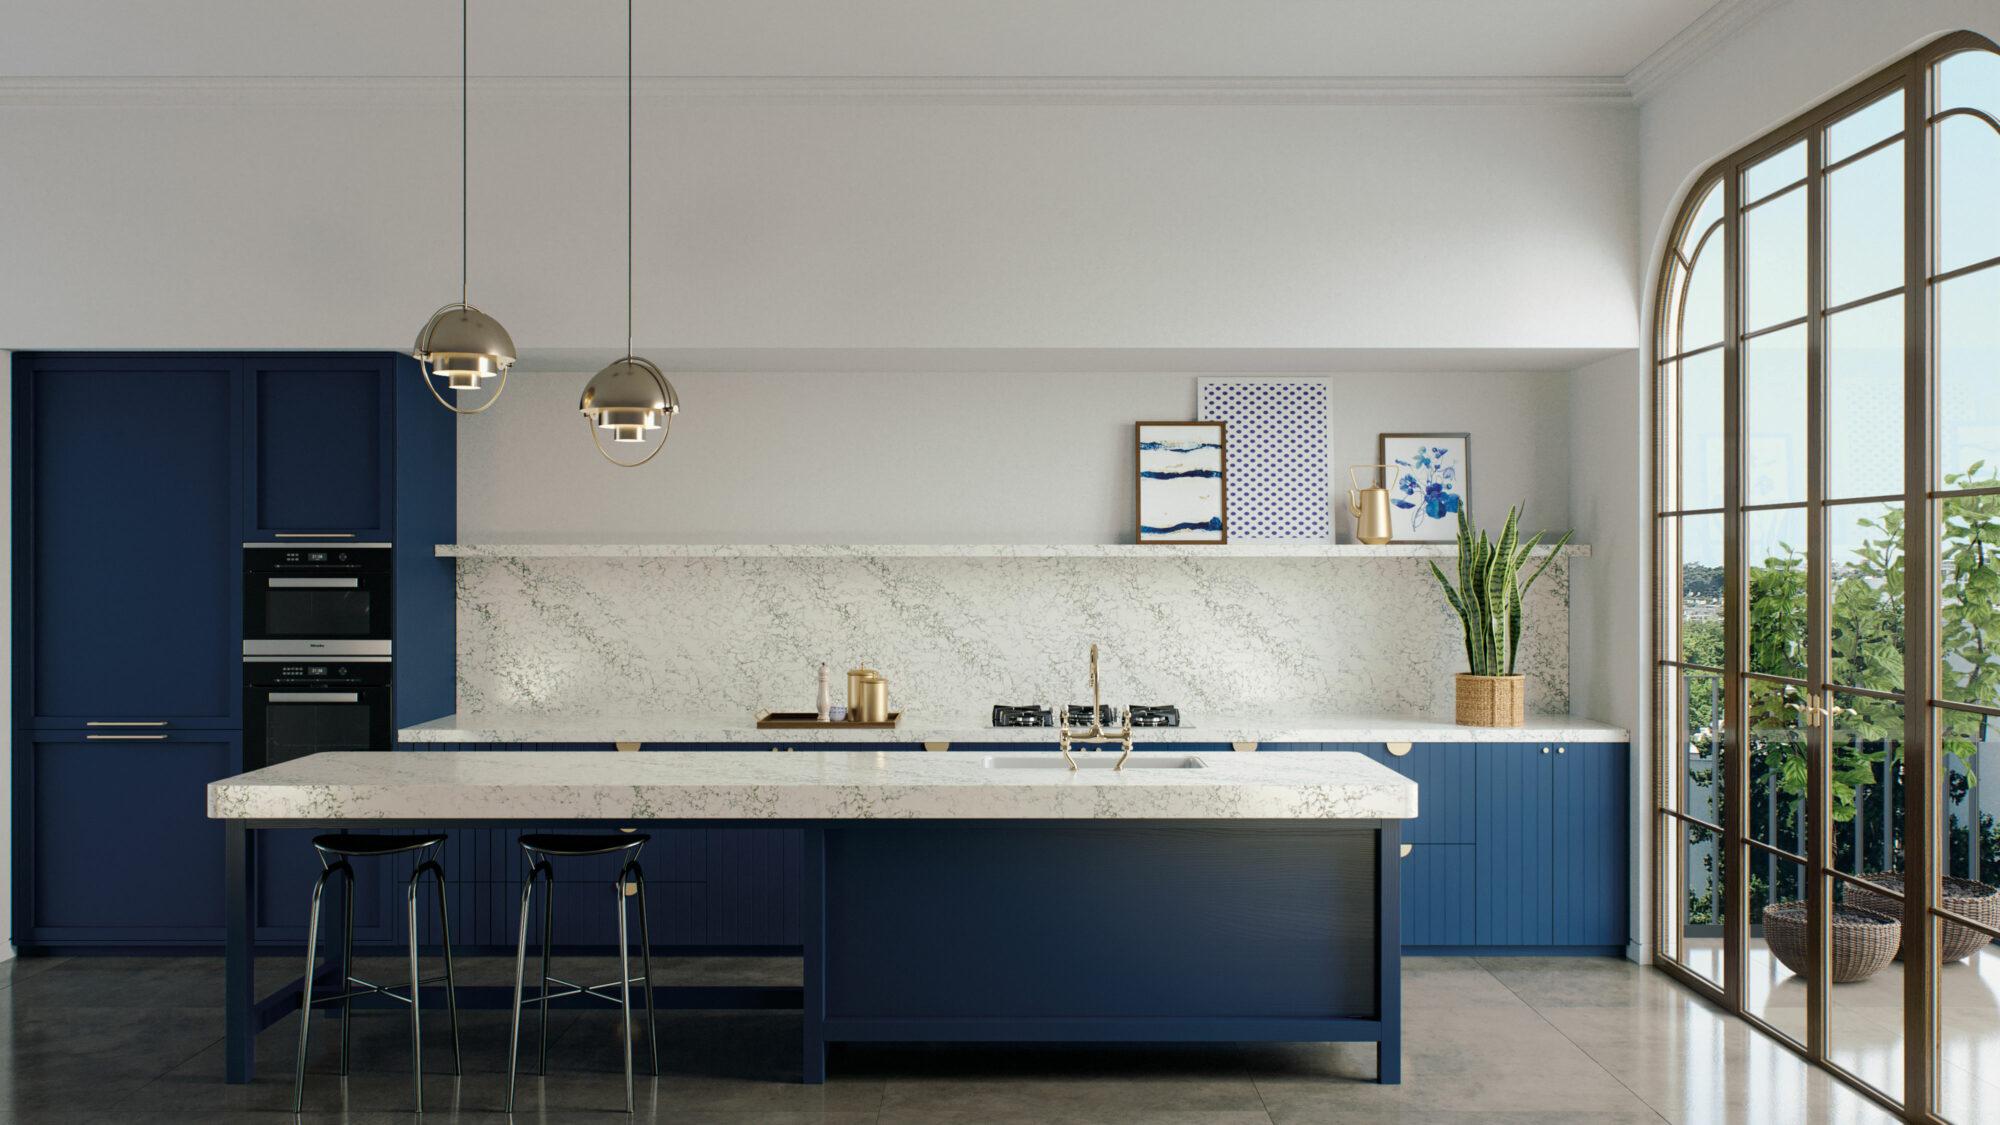 caesarstone arabeto on blue kitchen island